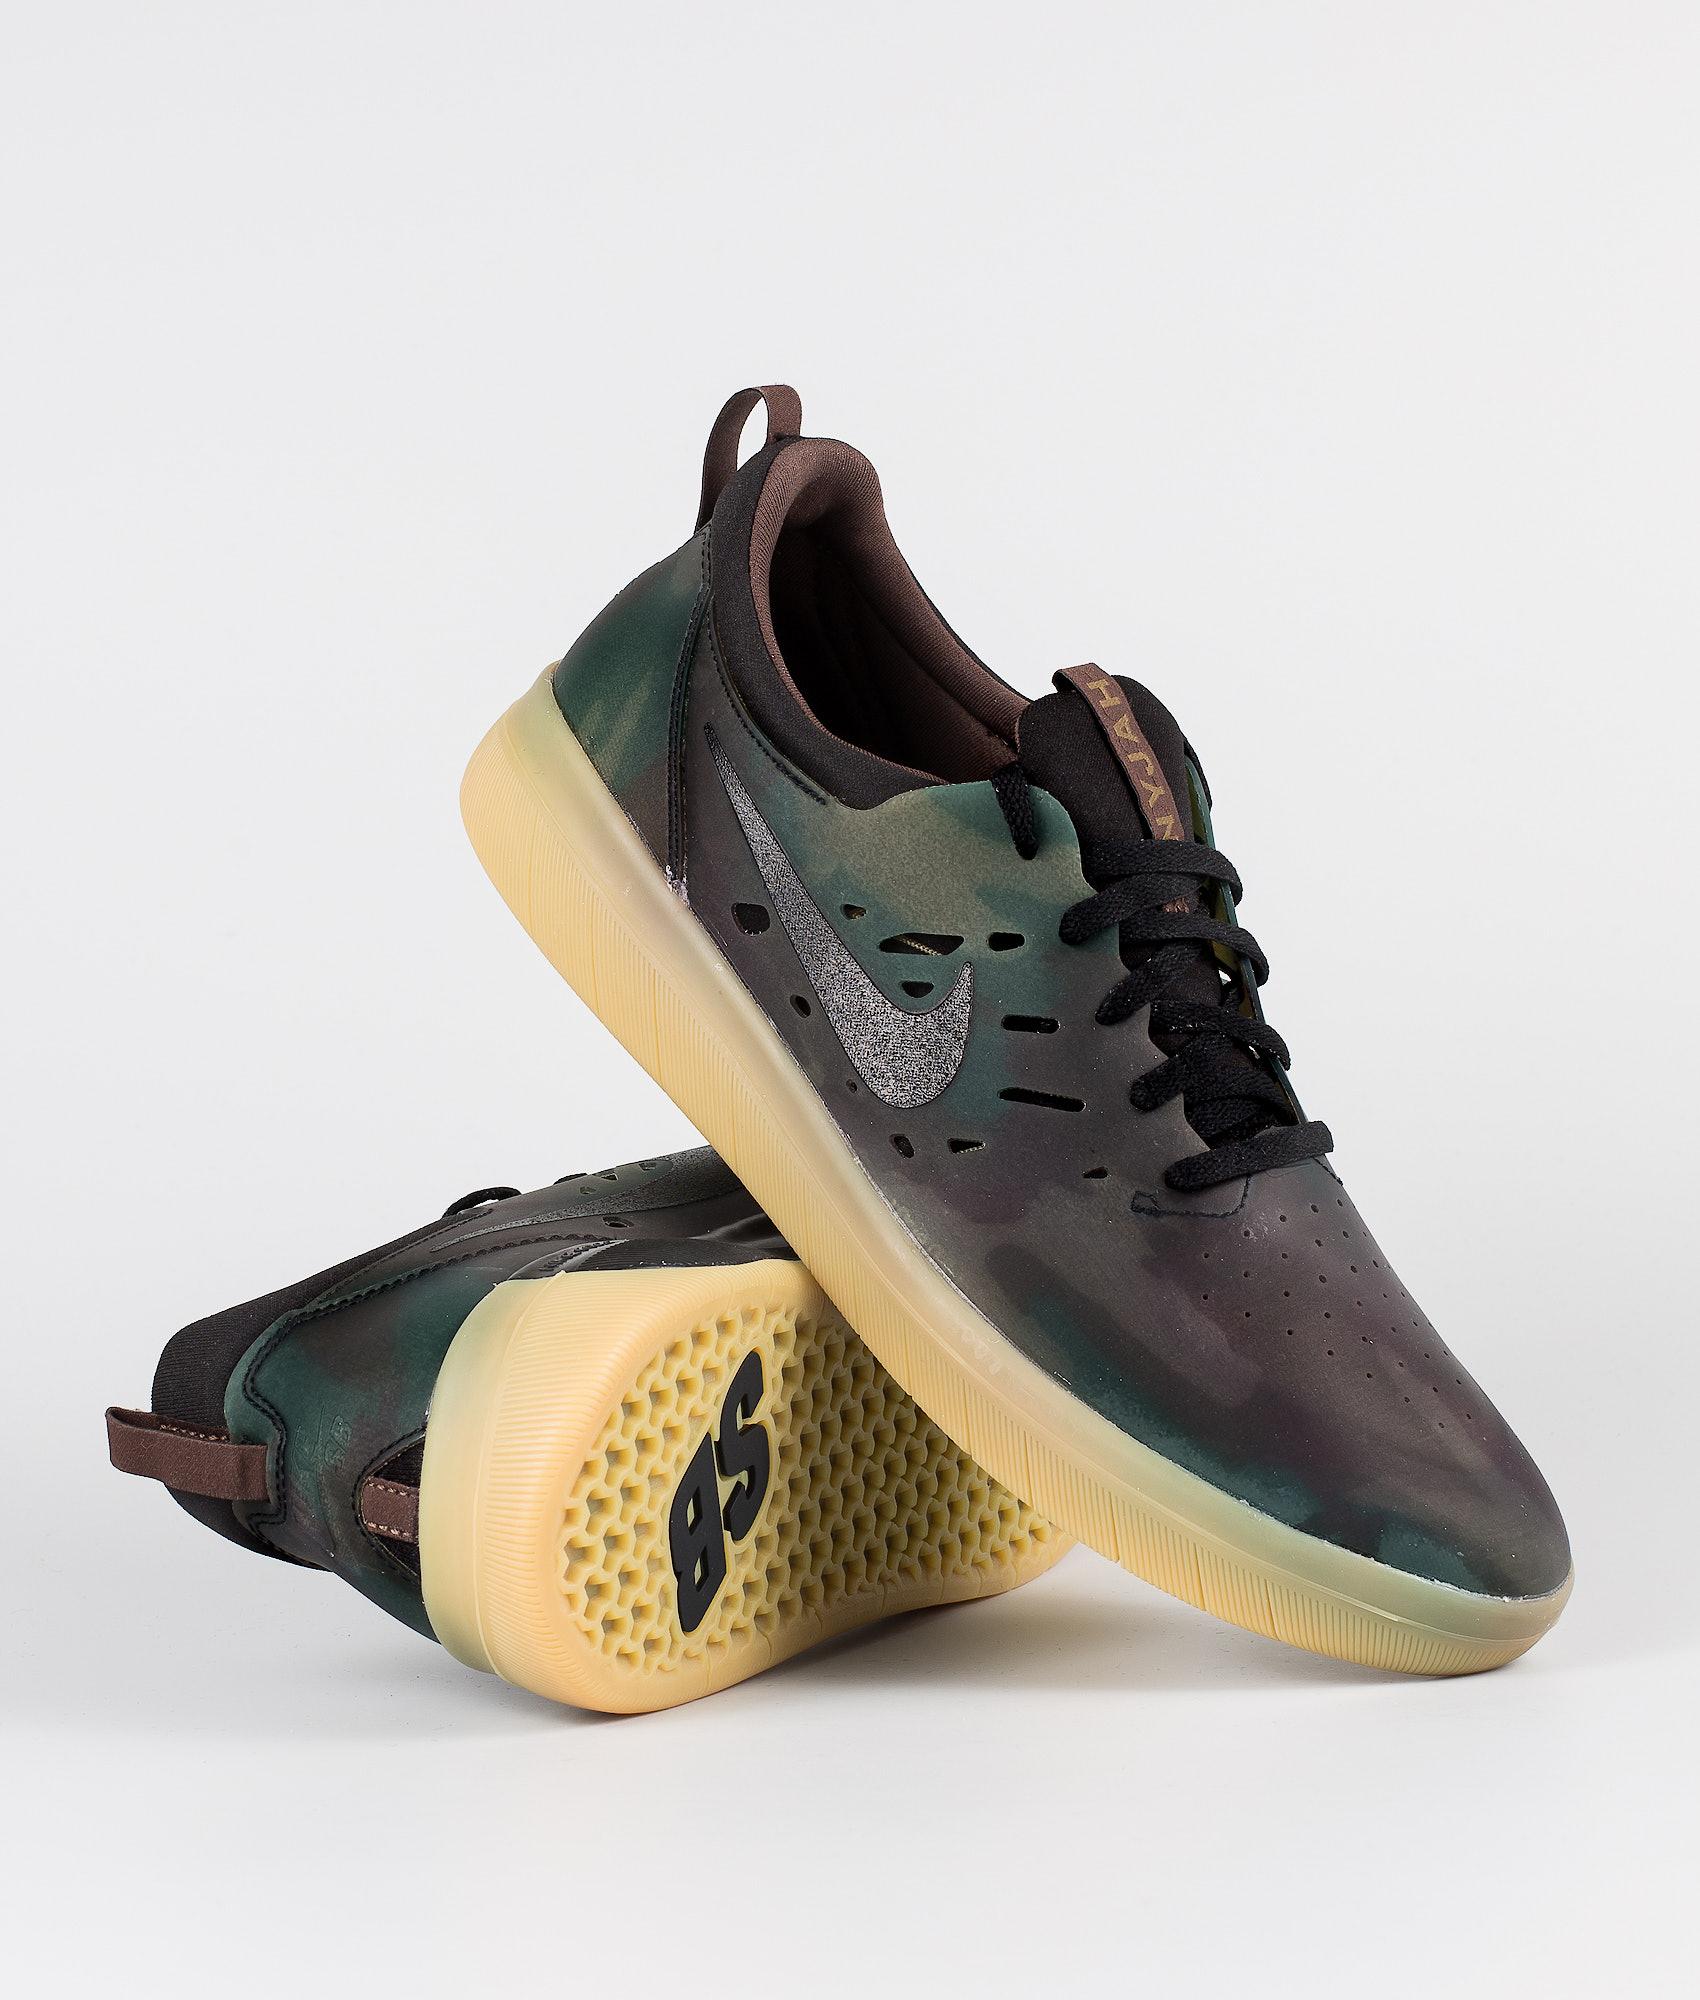 d1c113861da12 Nike SB Nyjah Free Prm Shoes Multi-Color/Black-Gum Light Brown ...